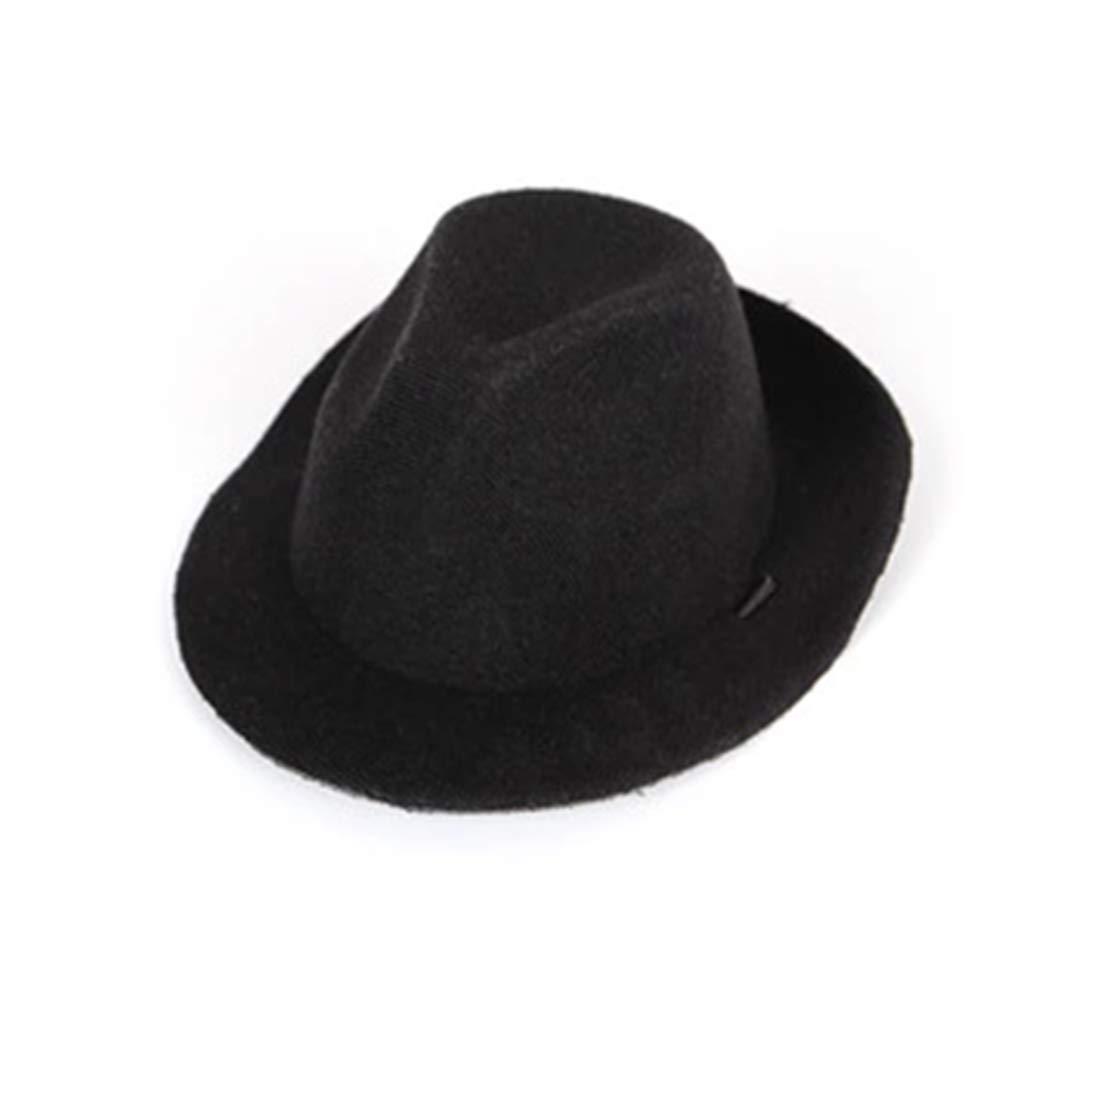 Cowboy hat black AdjustableWENNEW Pet Bounteous Cowboy Hat Magic Hat Gege Witch Hat Odd Halloween Dog Hat (color   Cowboy hat Beige, Size   Adjustable)